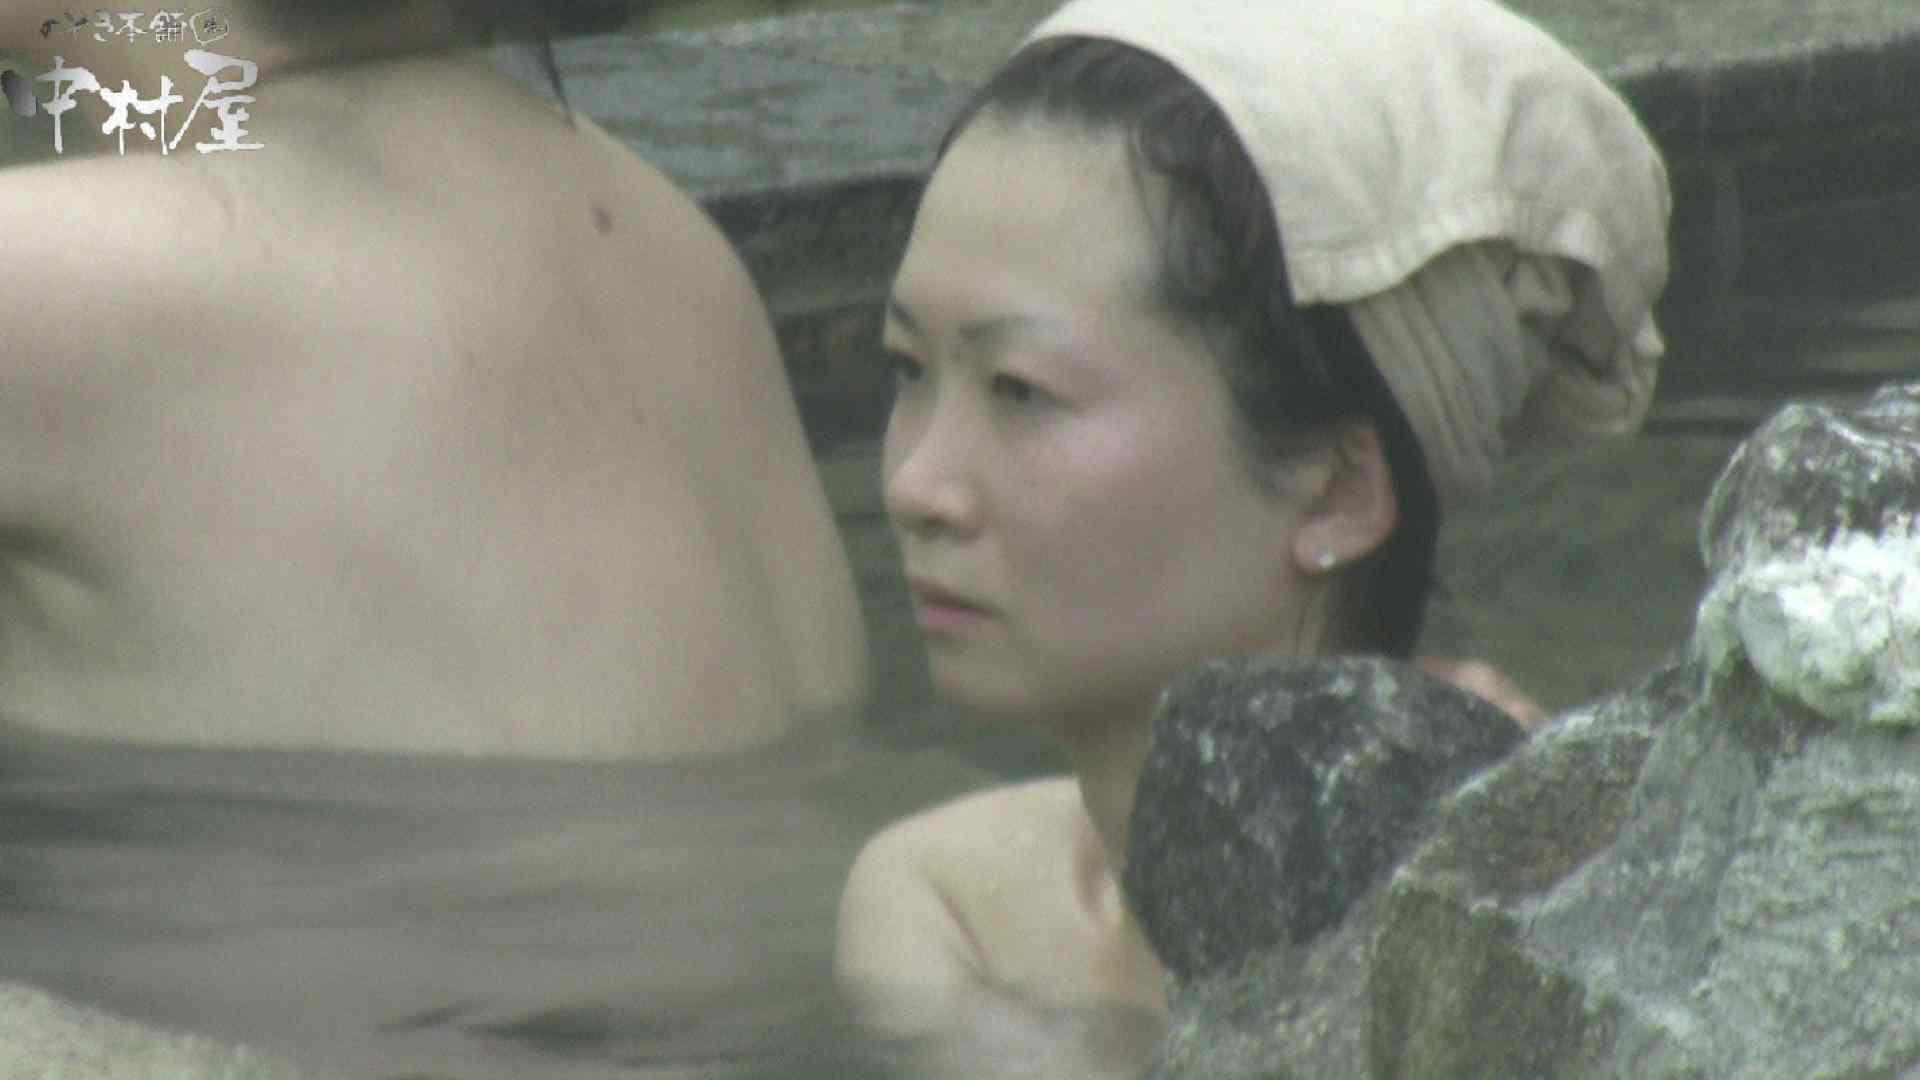 Aquaな露天風呂Vol.906 露天風呂編  86PIX 82